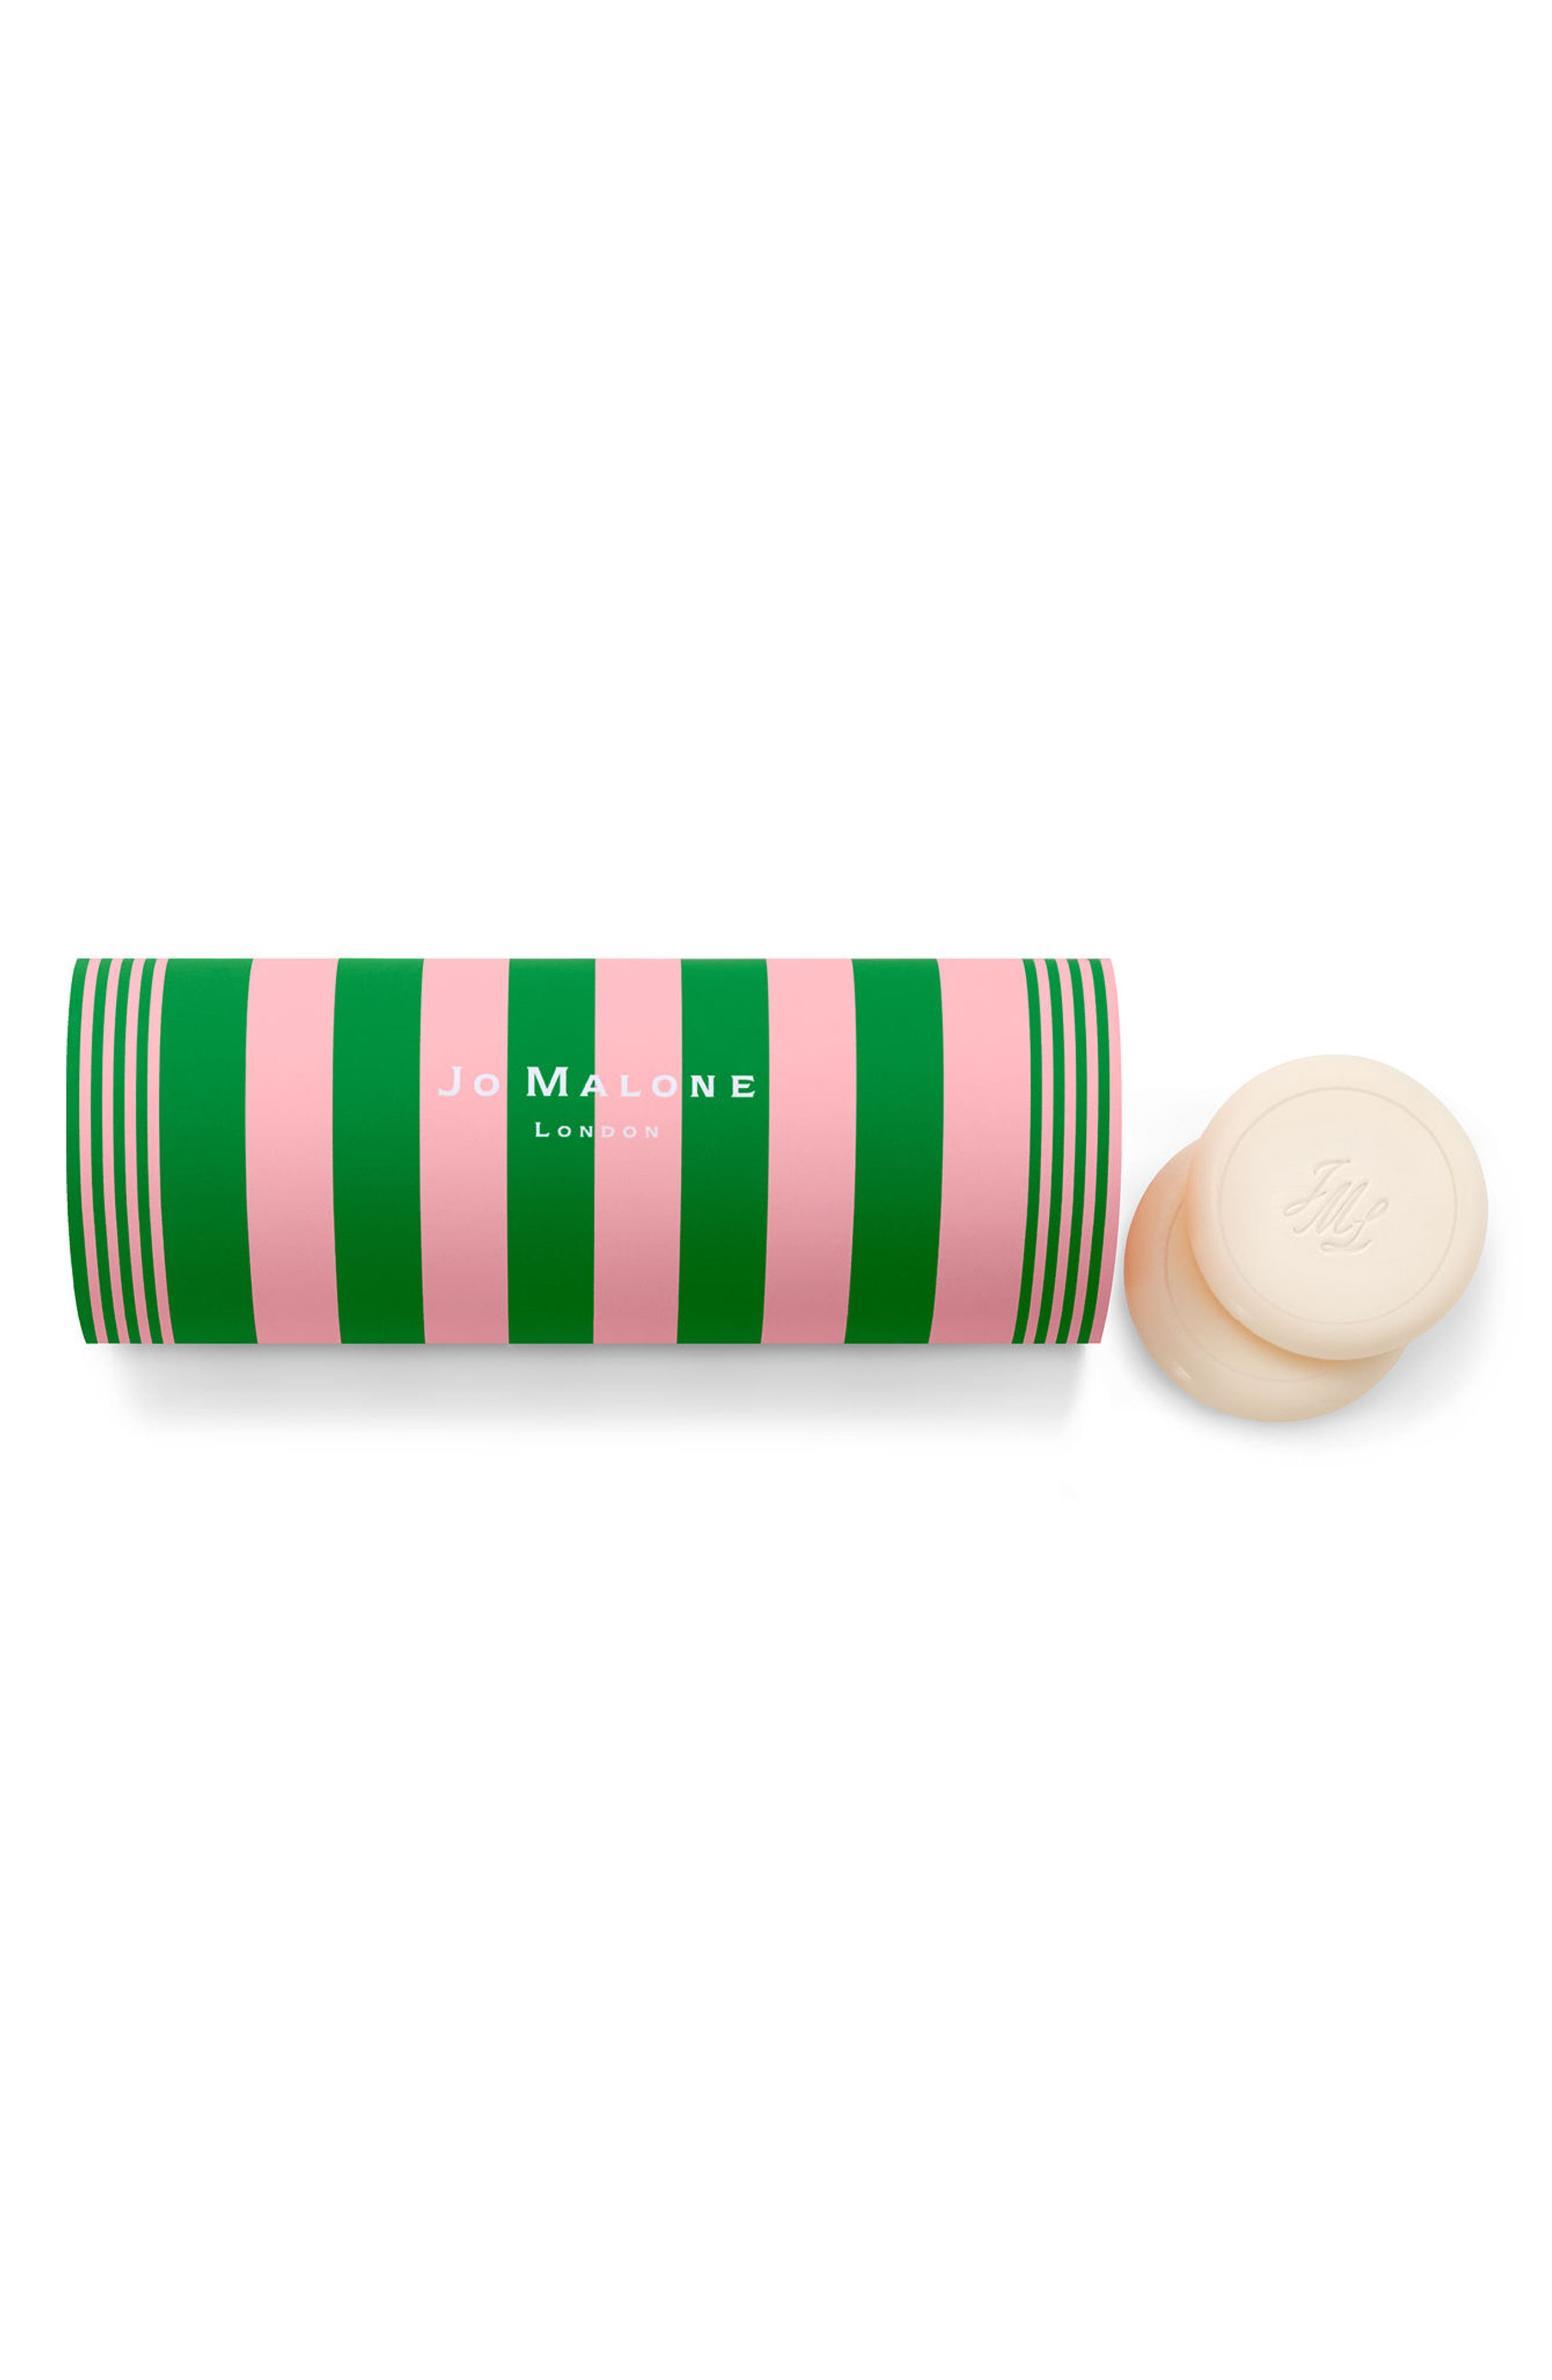 Holiday Miniature Soap Collection,                             Main thumbnail 1, color,                             No Color